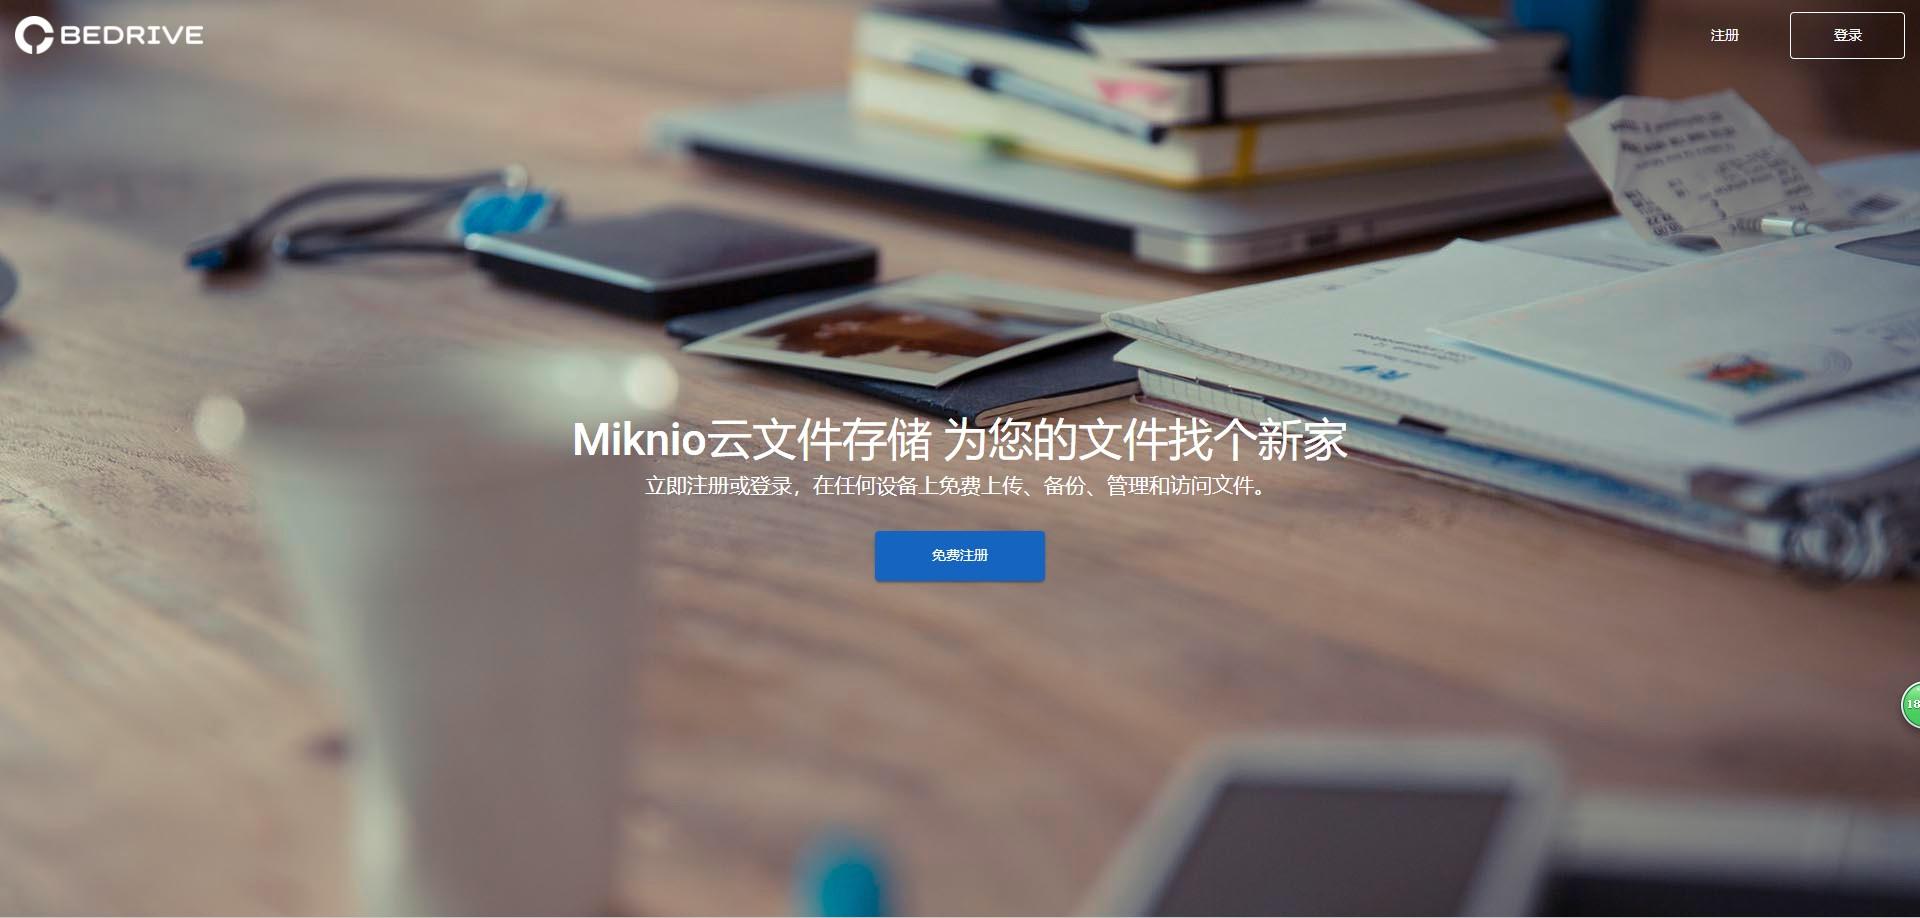 BeDrive v2.2.0专业网盘PHP程序破解版-常网小站Miknio